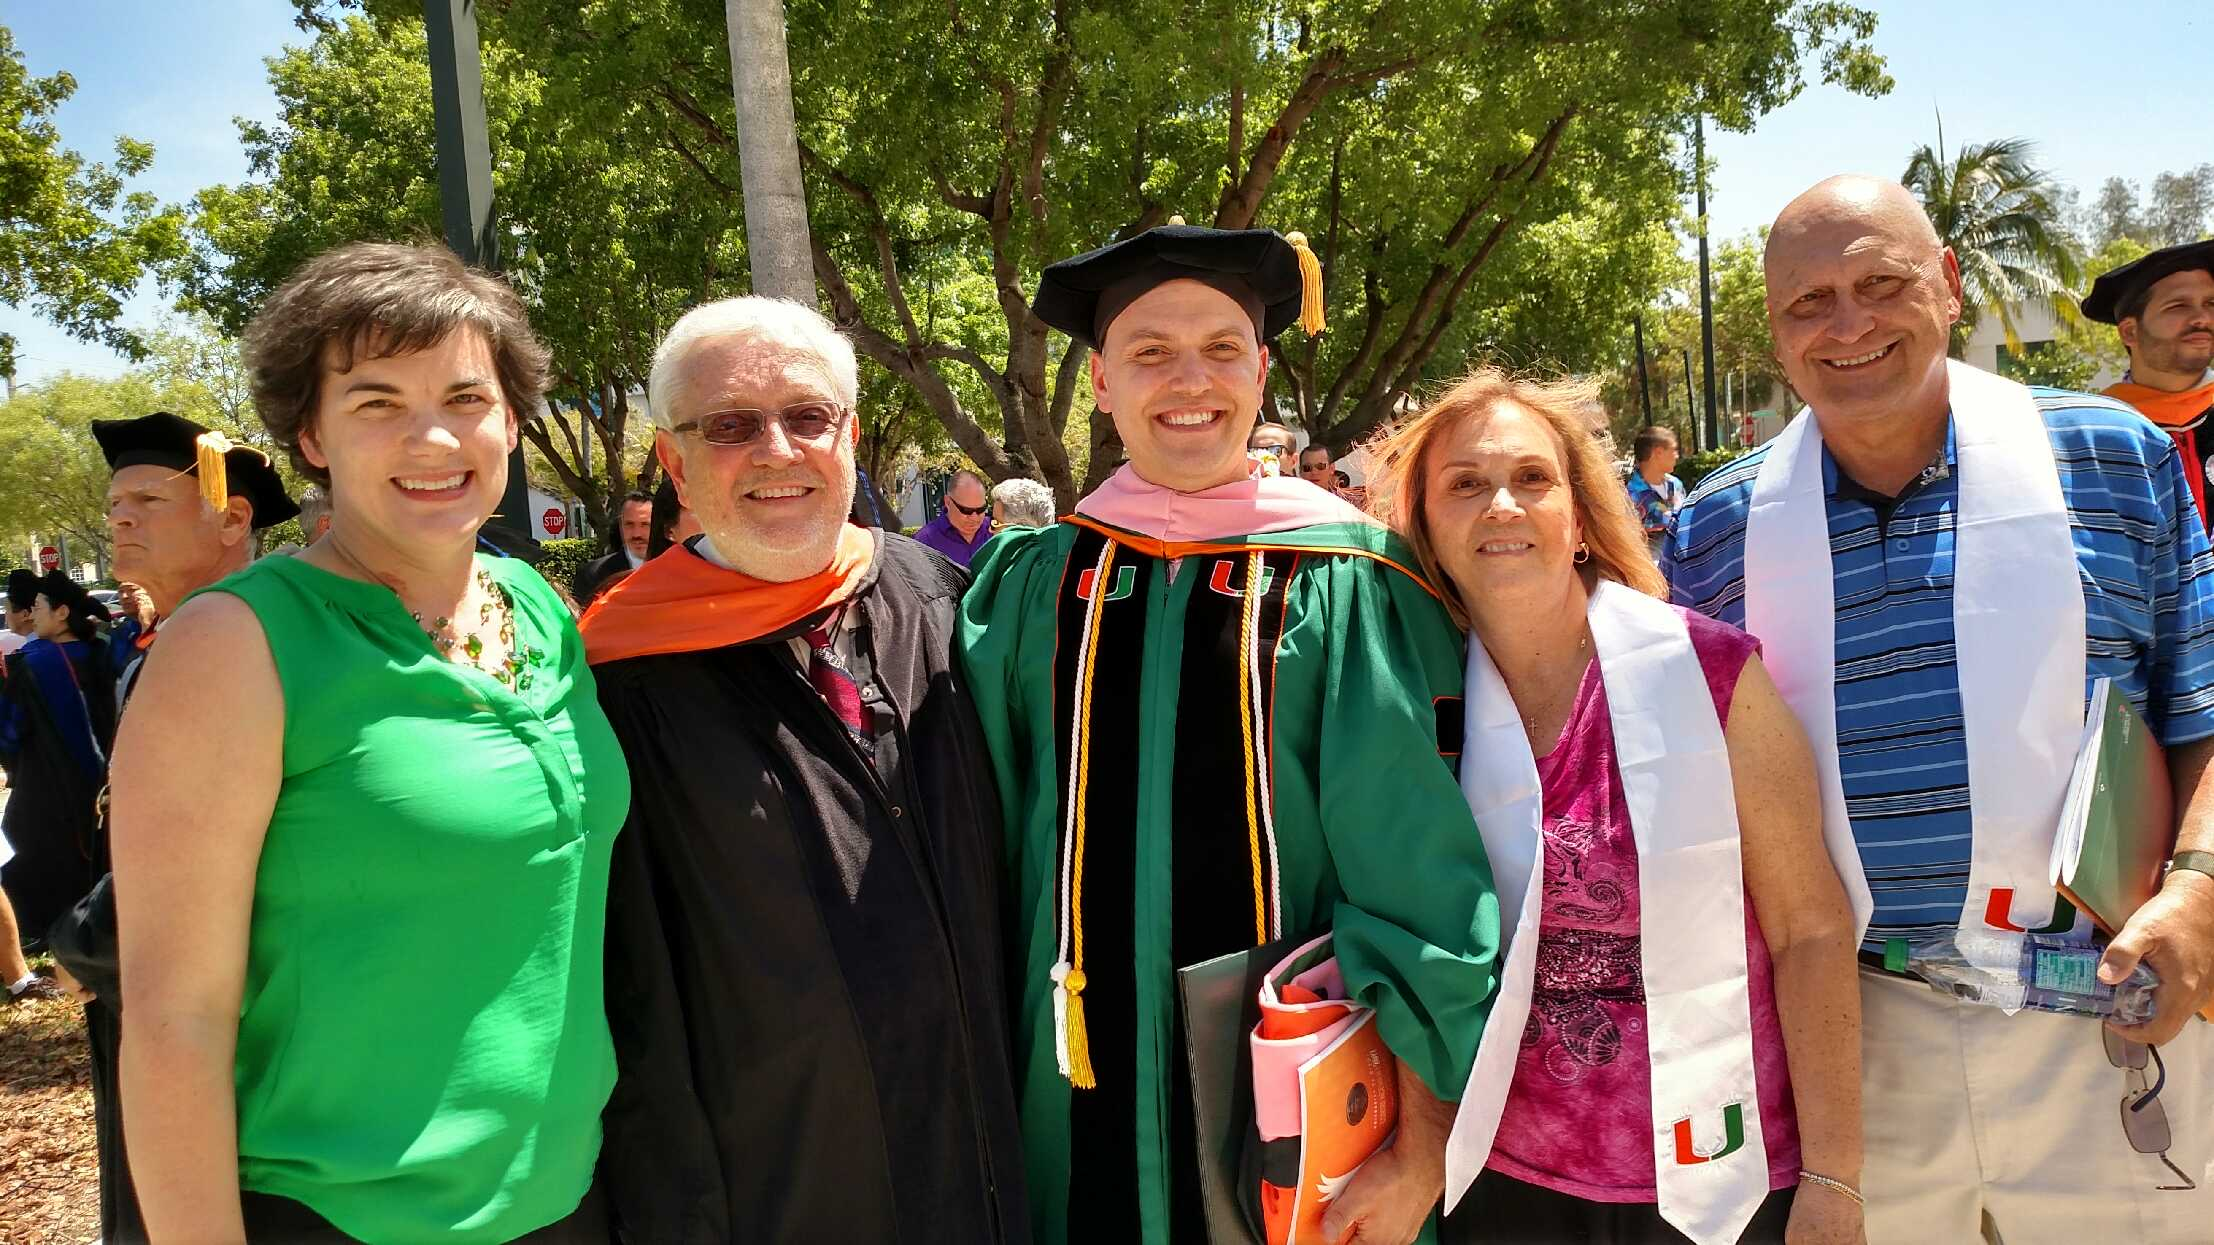 (Dr. Longo, Gary Lindsay, the new Dr. Longo, Georgie, & Bill)